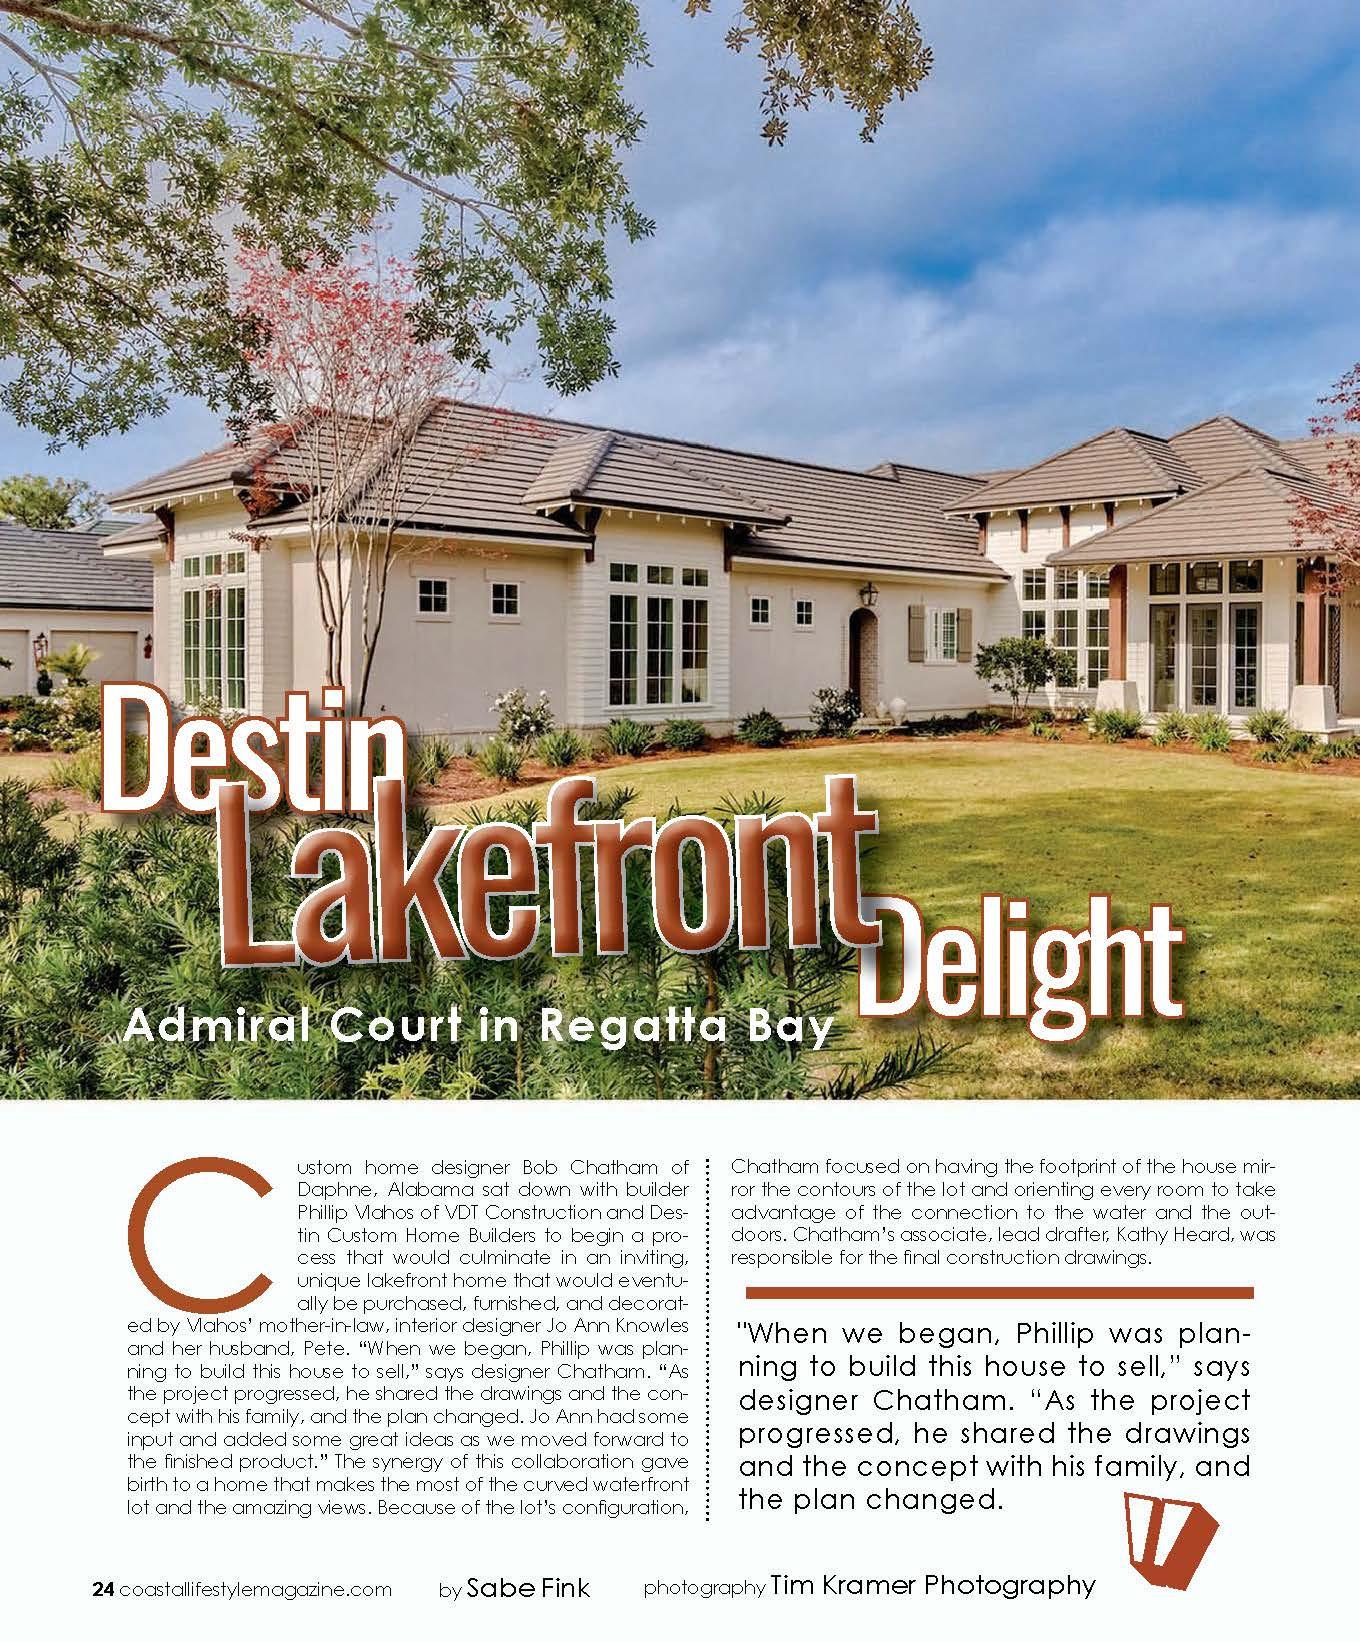 Coastal Lifestyle article of Destin Delight